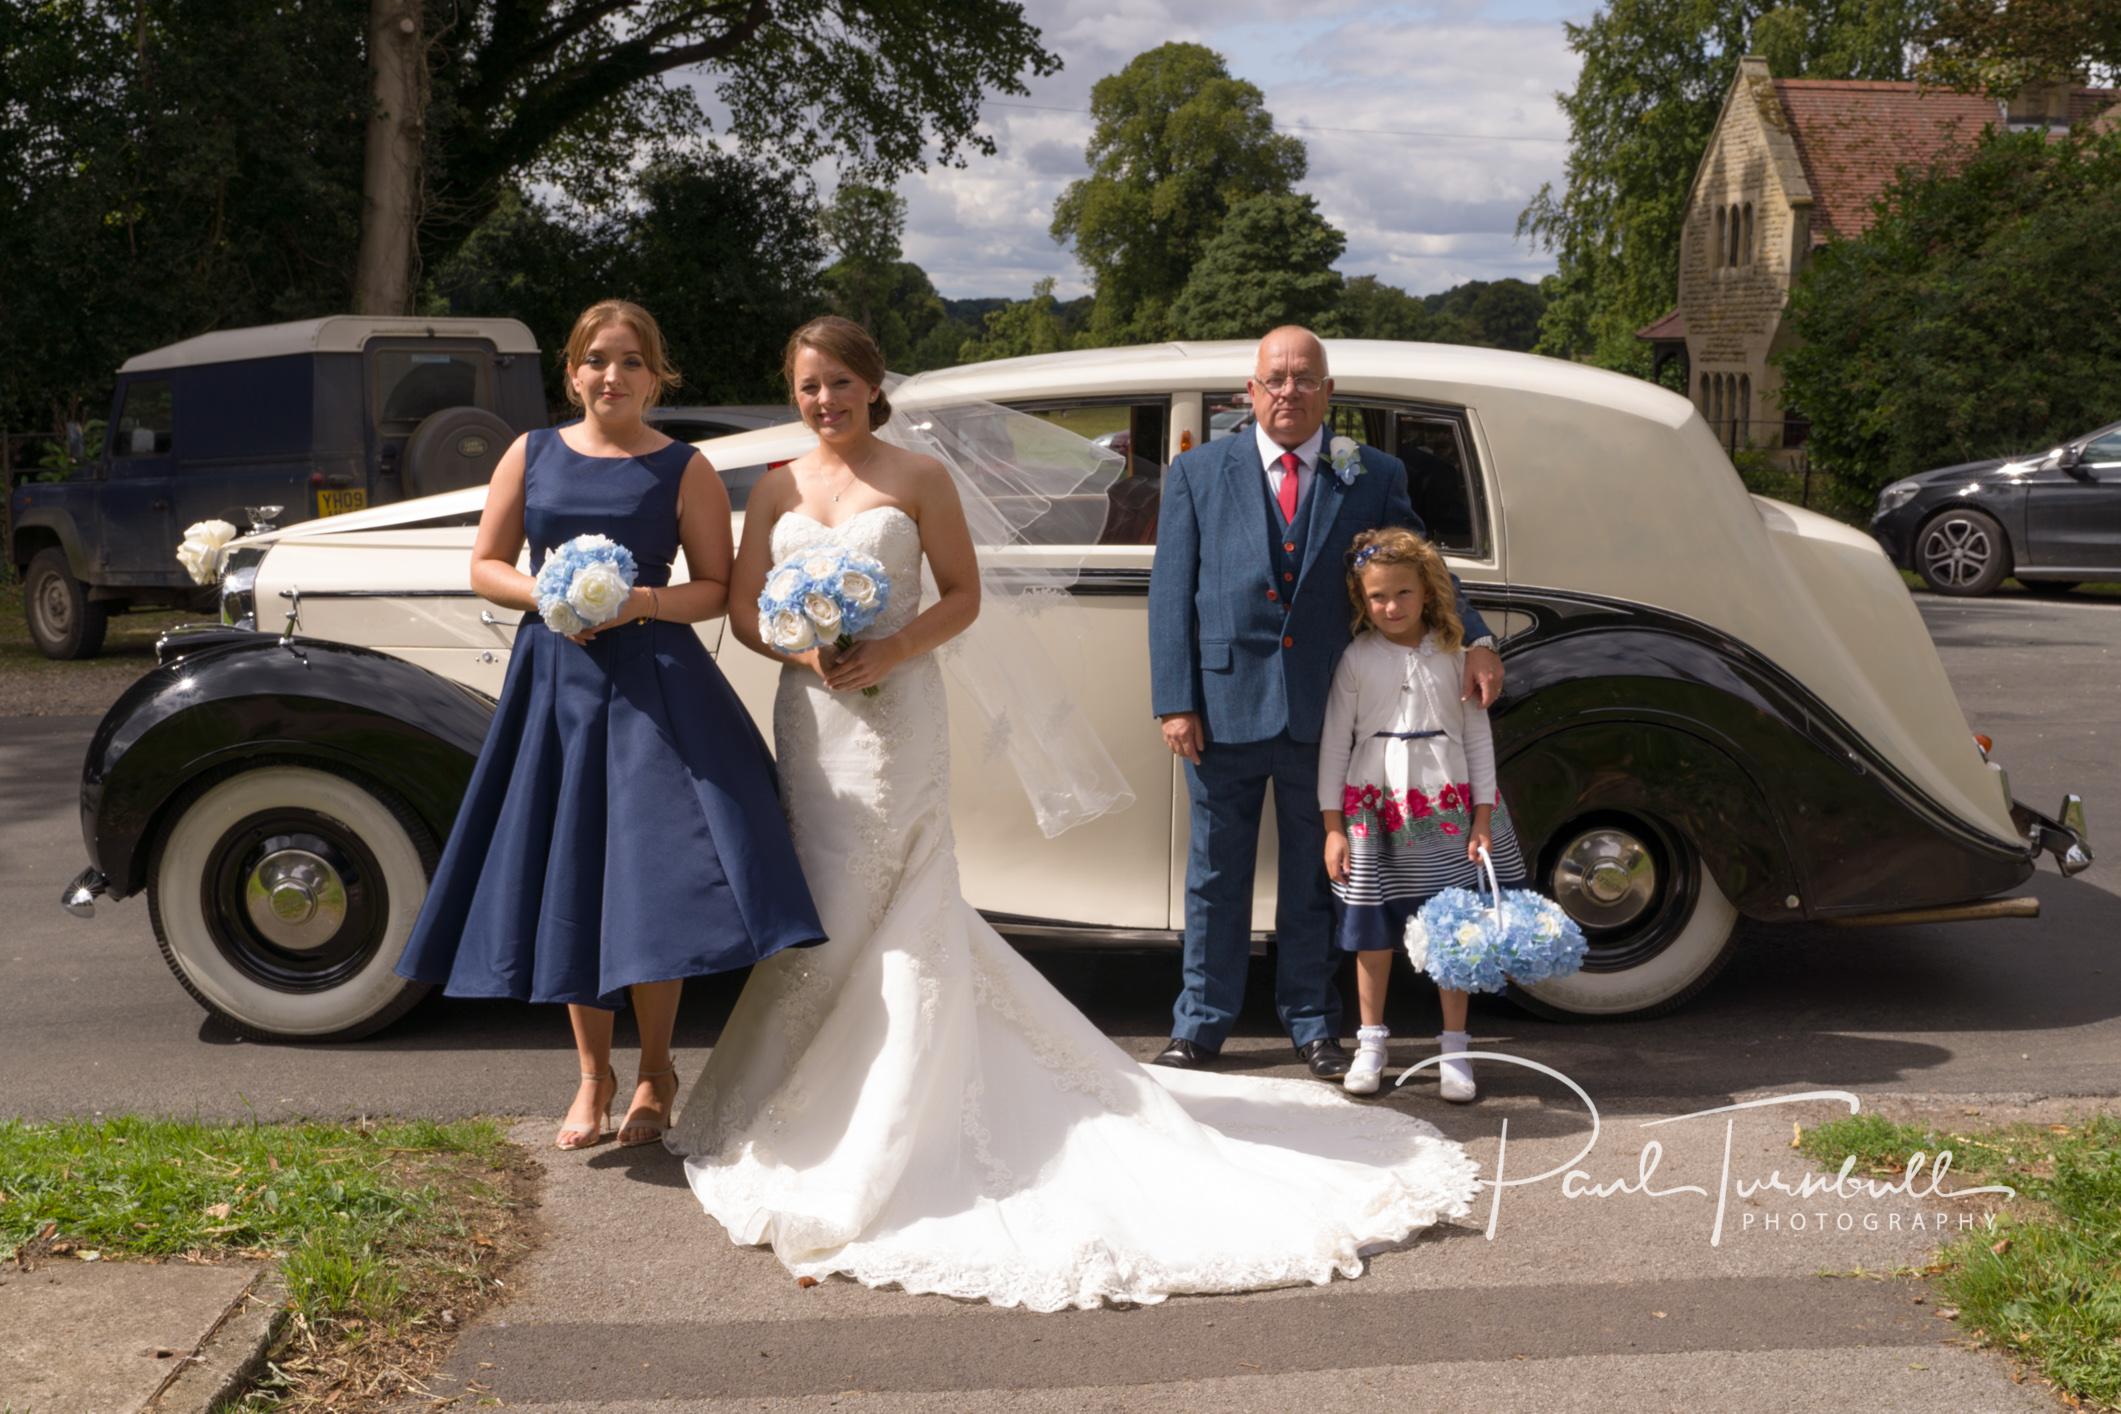 wedding-photographer-south-dalton-walkington-yorkshire-emma-james-030.jpg